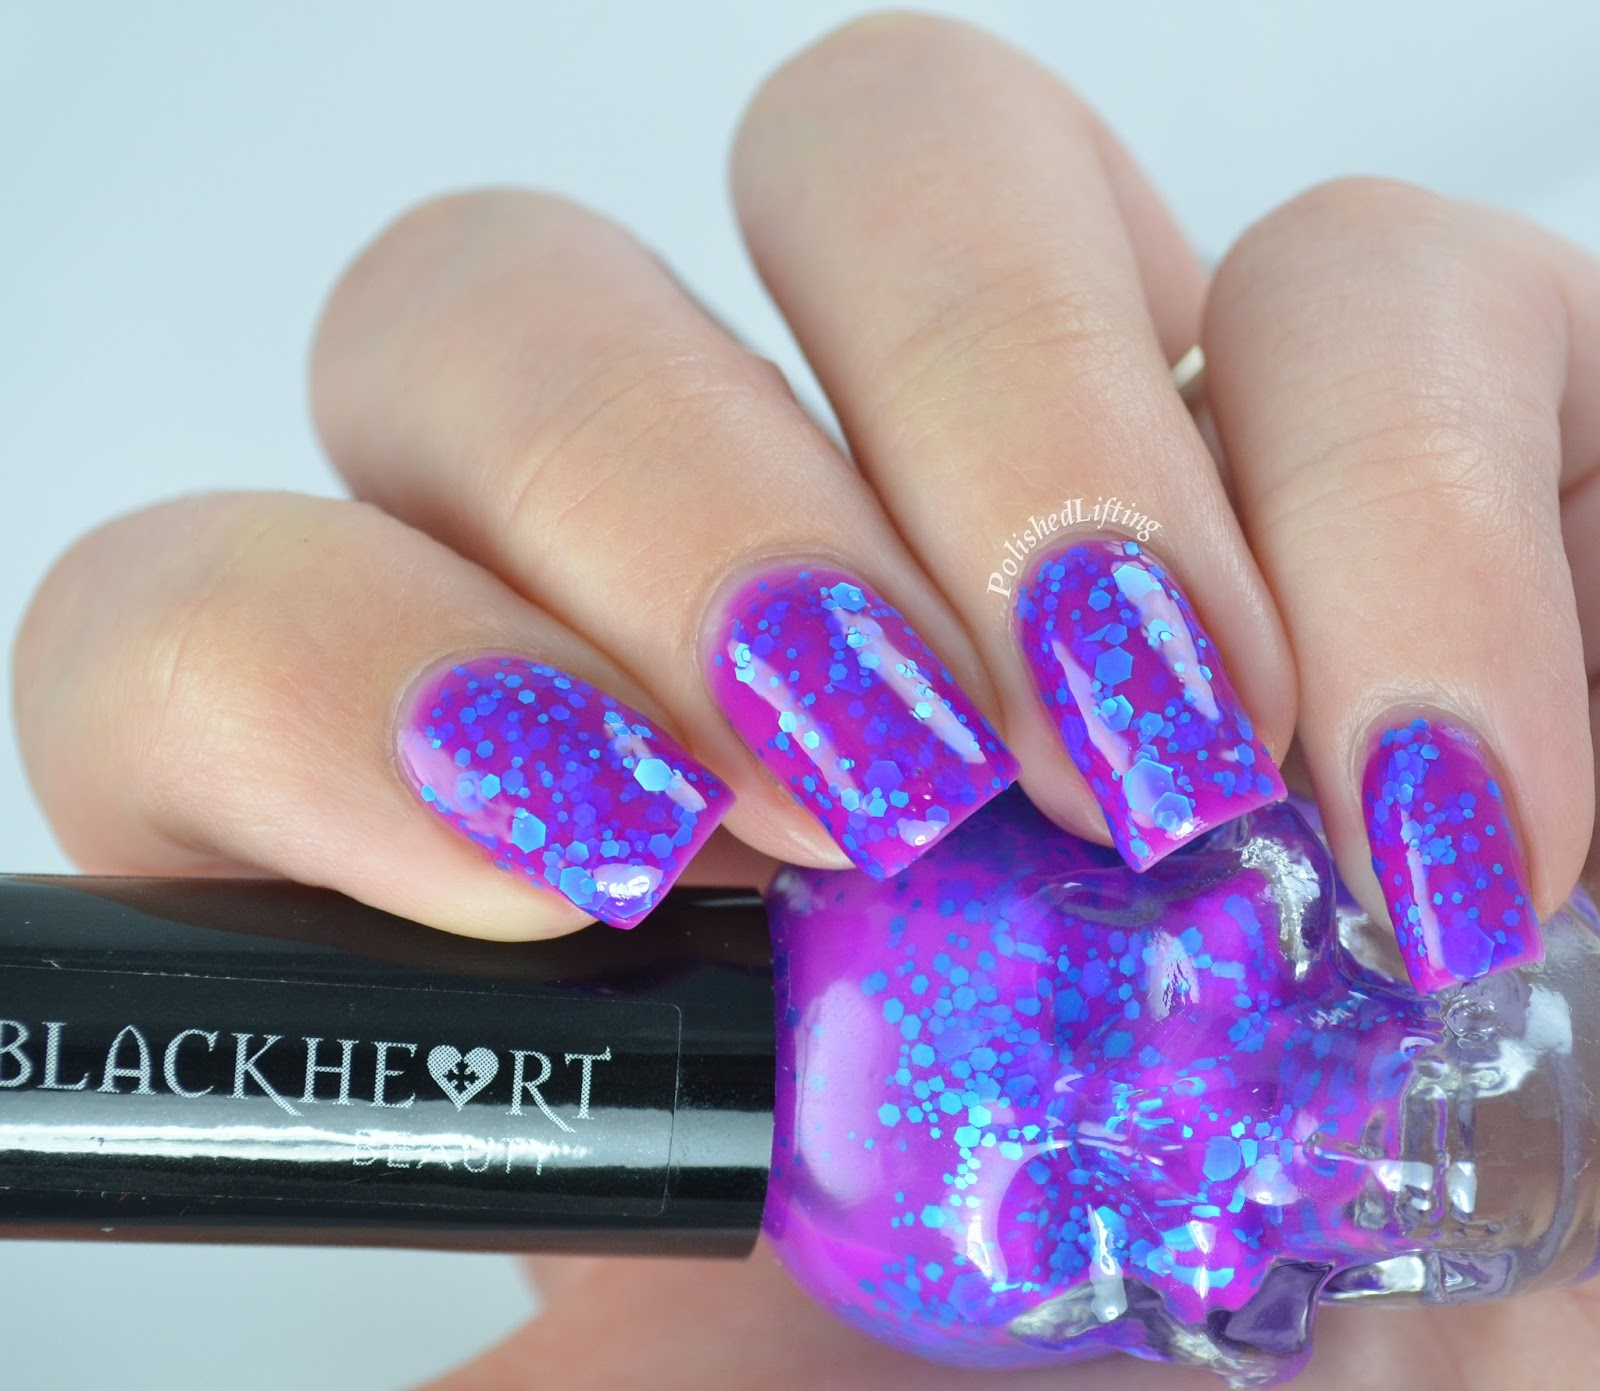 BlackHeart Beauty Violet Blue Glitter Nail Polish